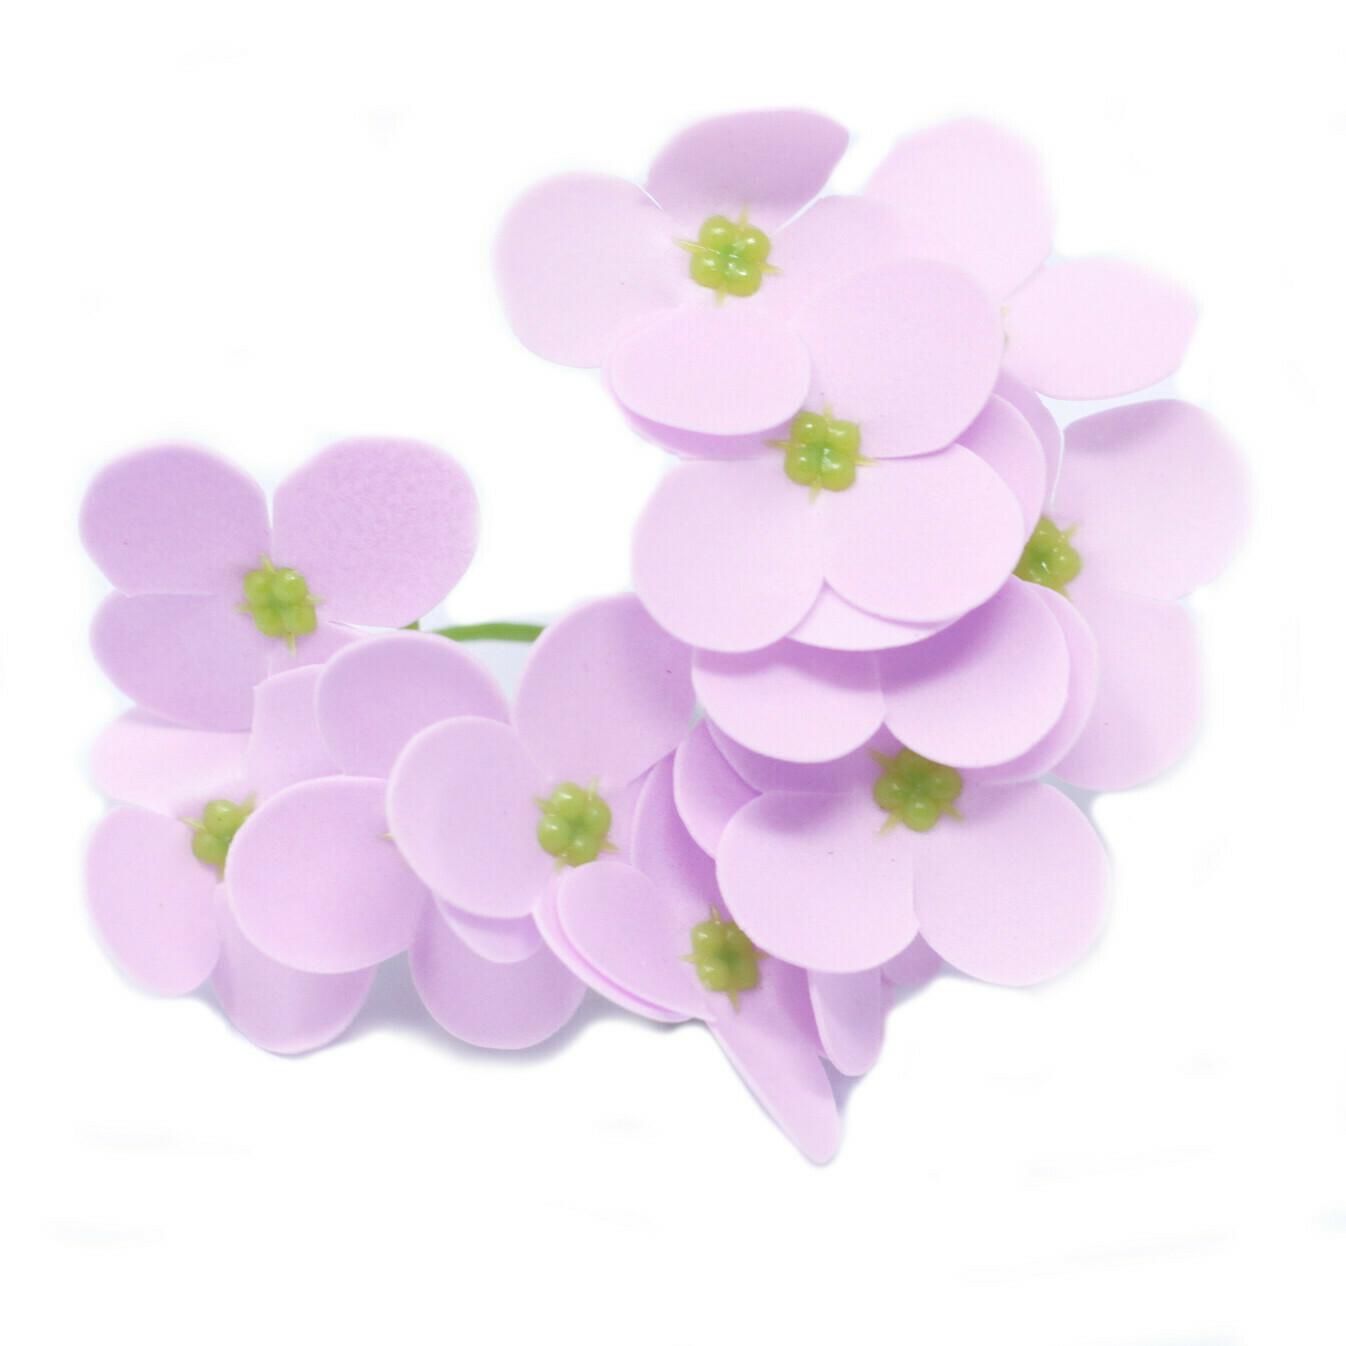 Craft Soap Flowers - Hyacinth Bean - Lavender soap